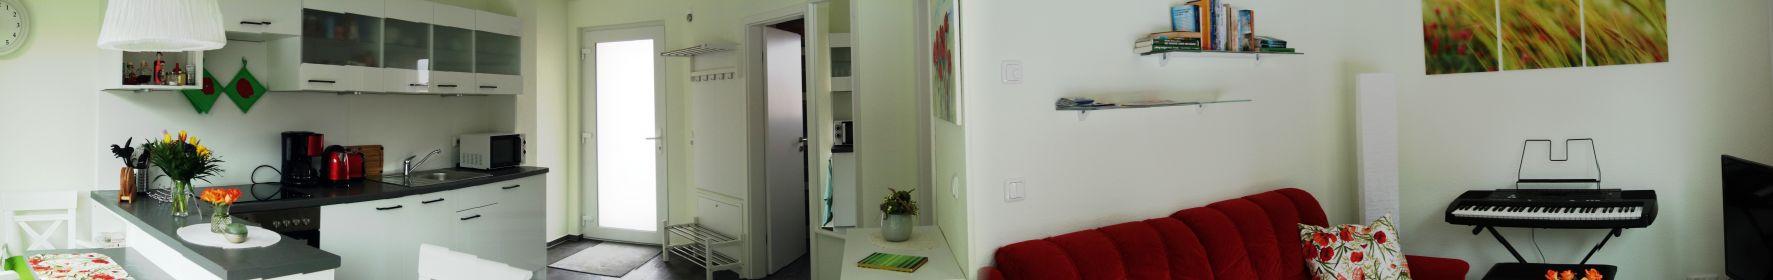 ferienwohnung-klatschmohn-panorama-1